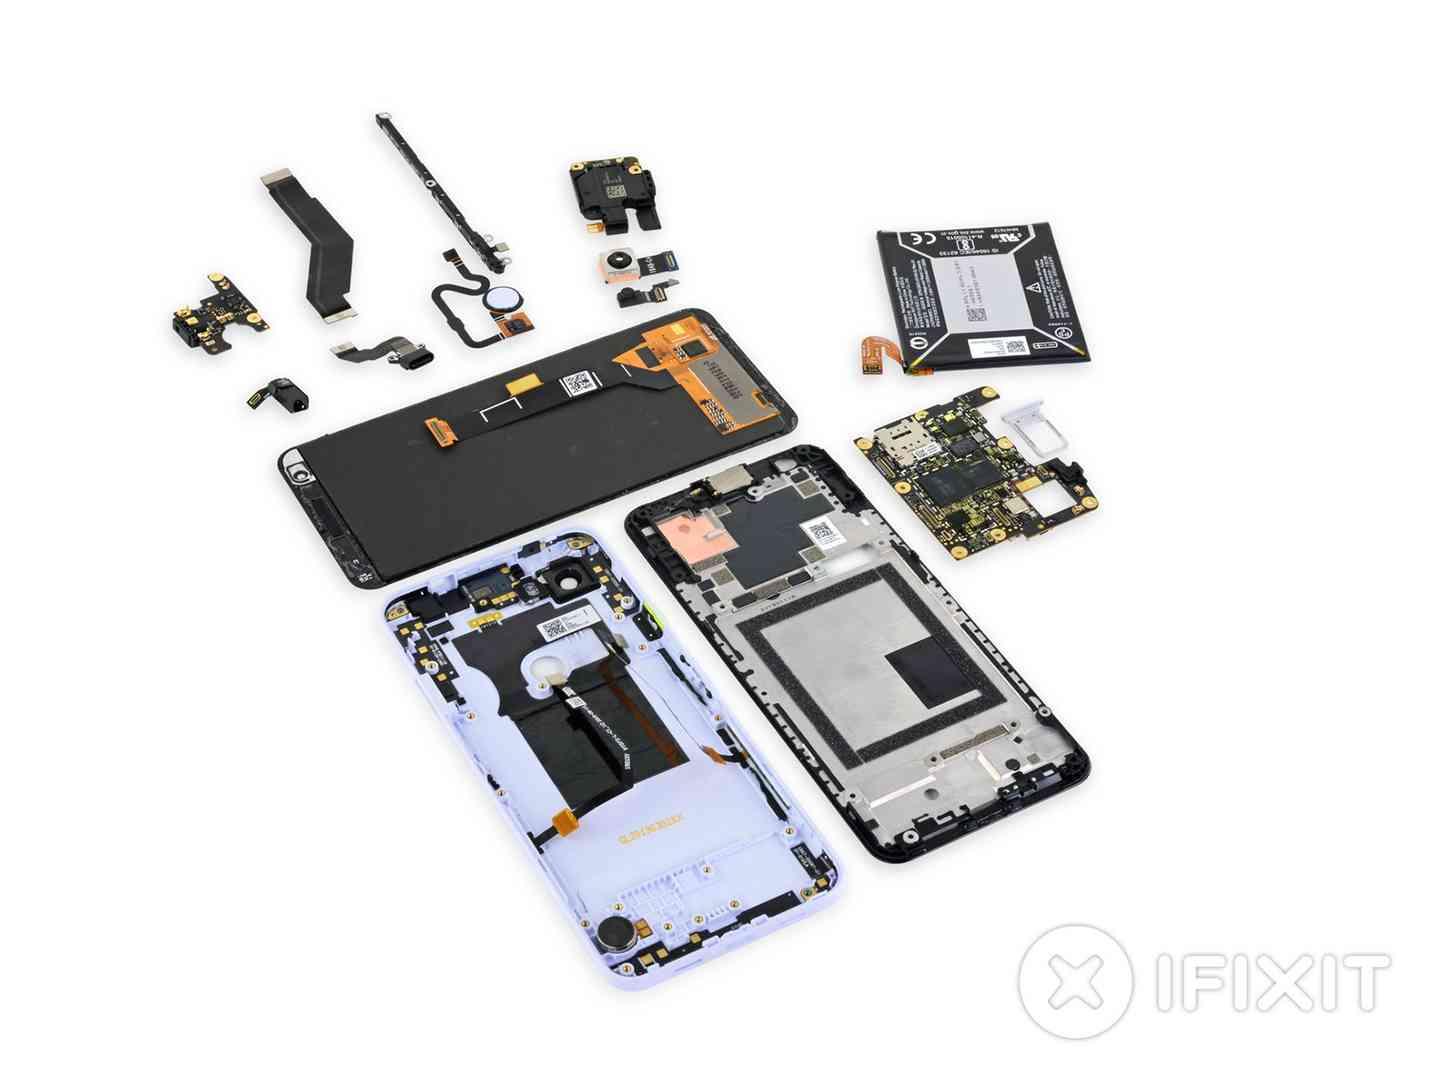 Pixel 3a teardown components